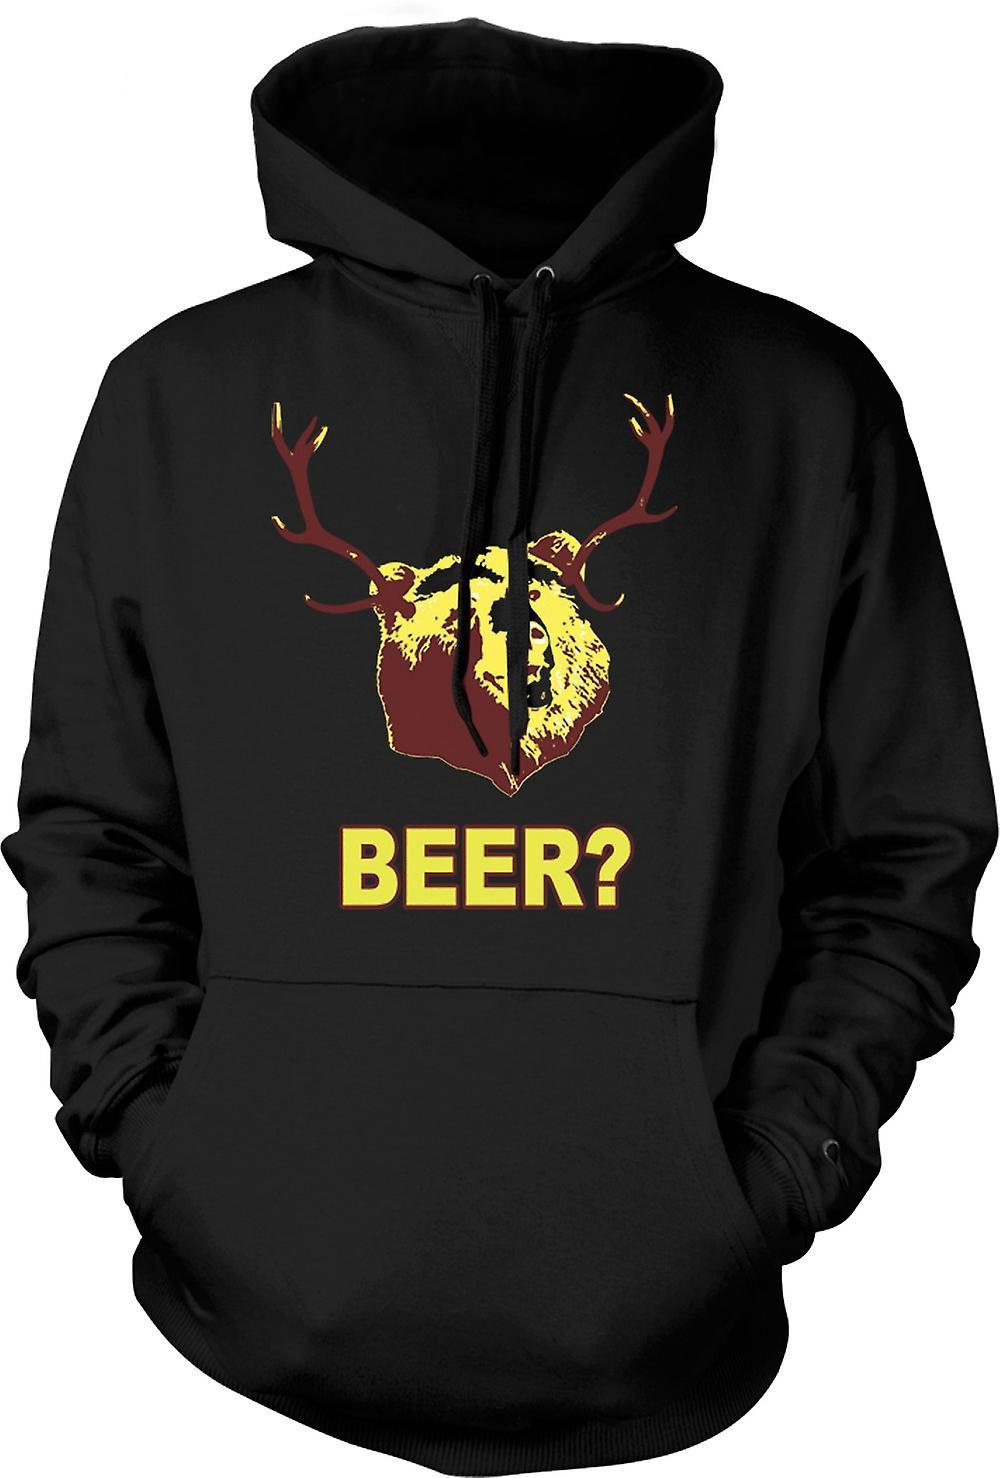 Mens-Hoodie - Bier tragen lustige trinken